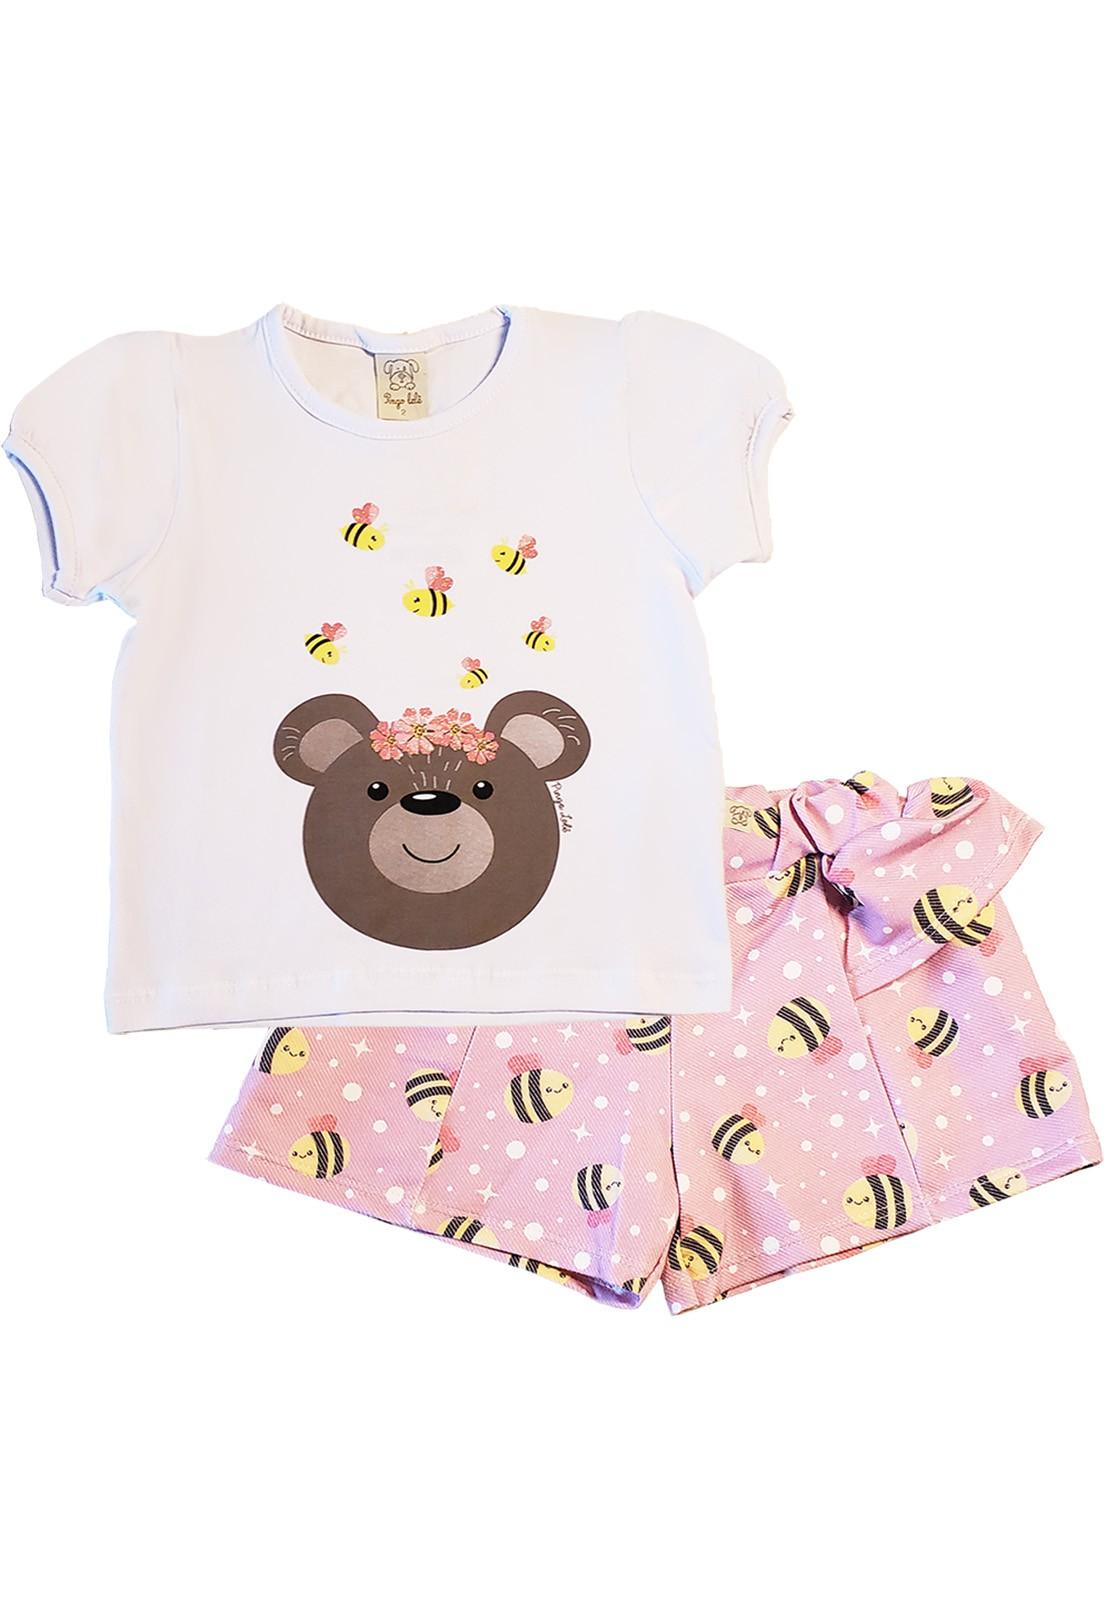 Conjunto Infantil Camiseta  manga curta com  short Pingo Lelê  Abelha Rosa e Branco